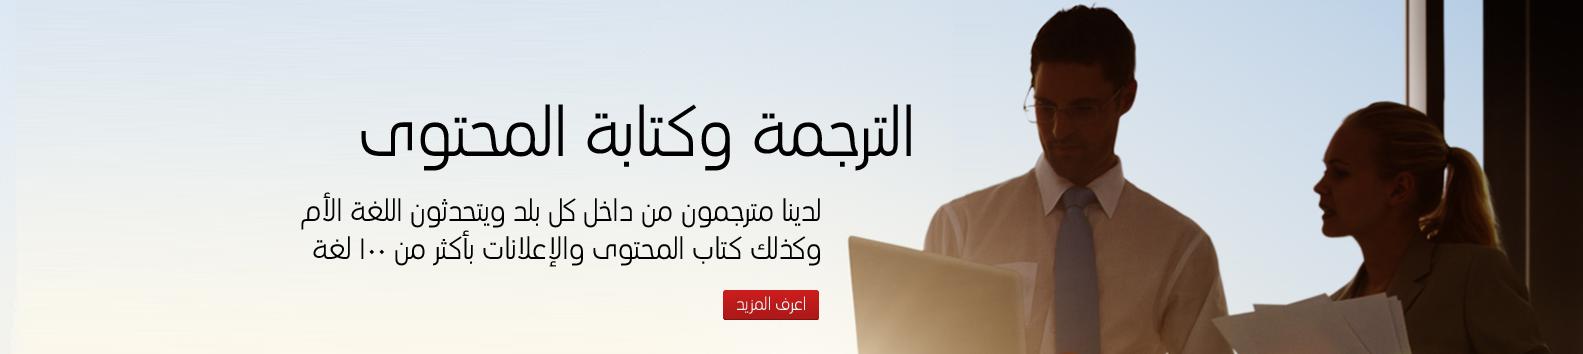 01-gpi-website-localization-ar_2